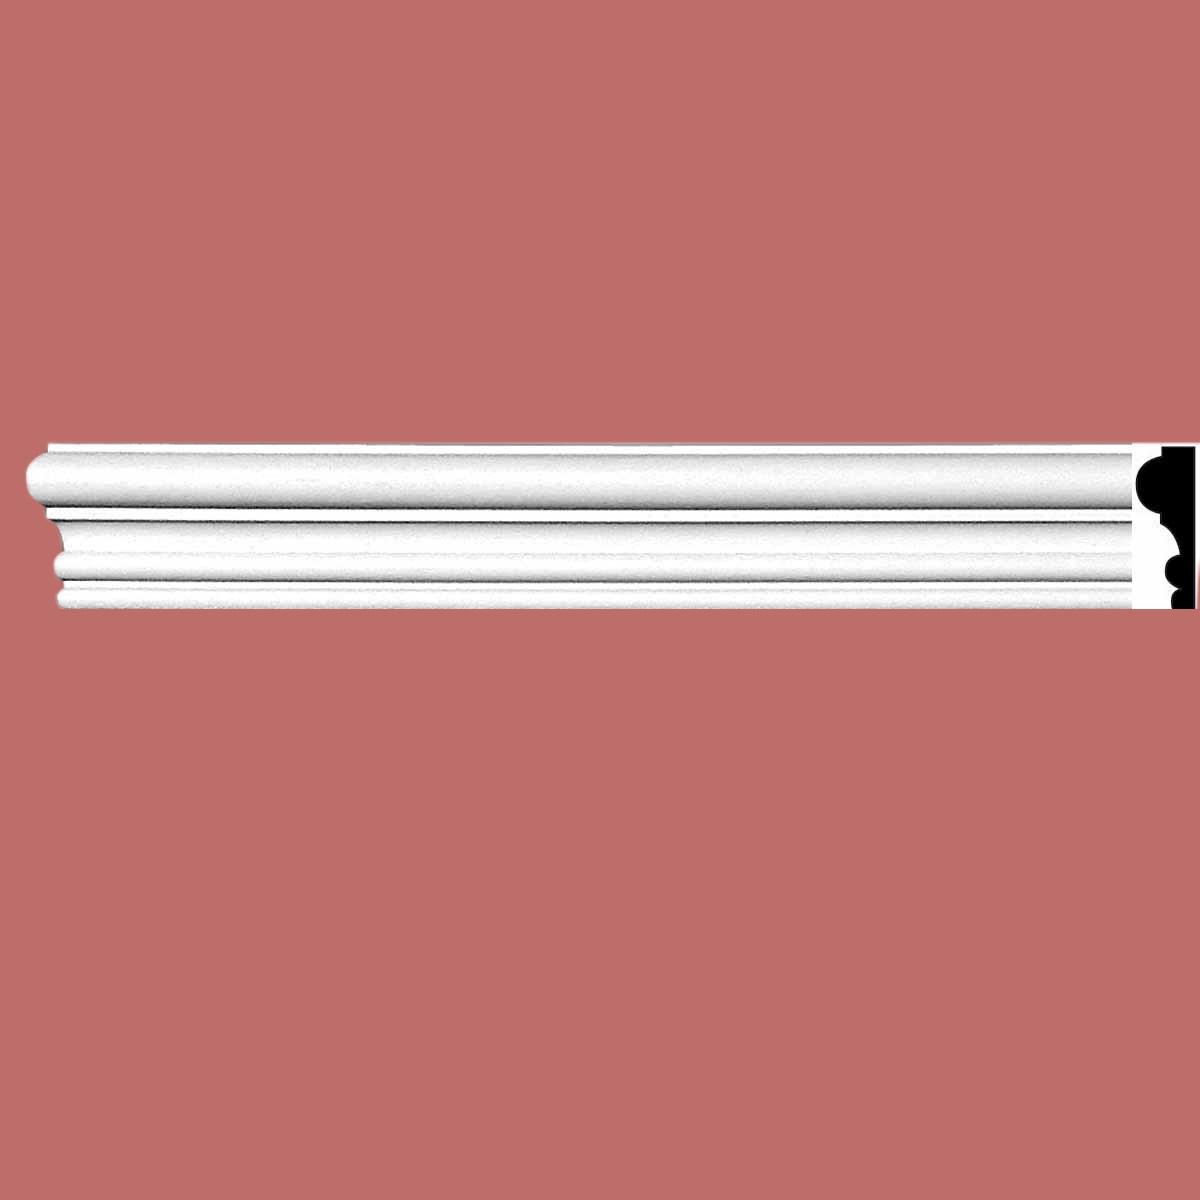 Cornice White Urethane Sample of 11570 24 Long Cornice Cornice Moulding Cornice Molding